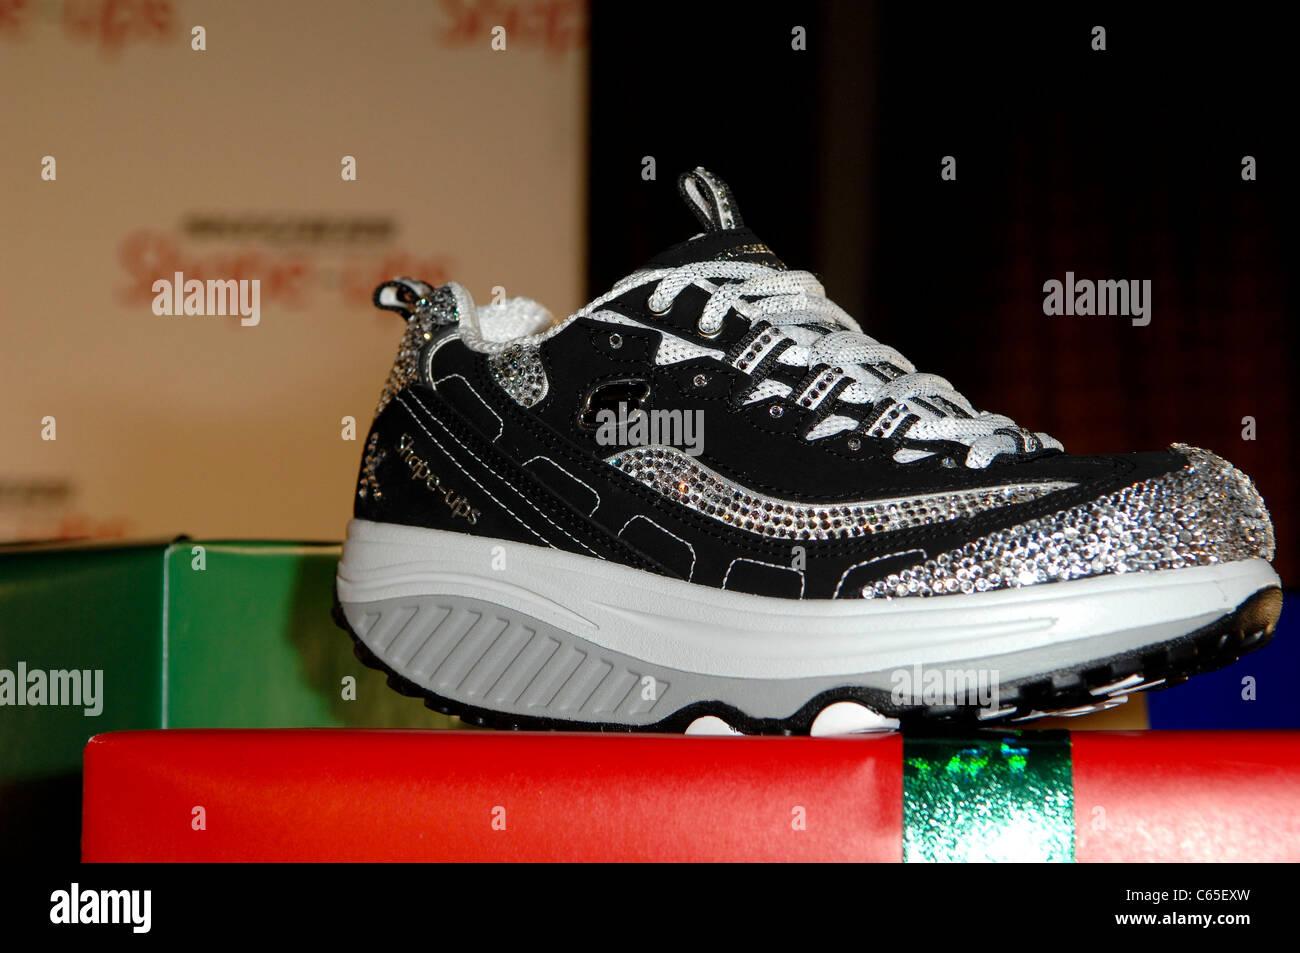 Skechers Shoes Immagini e Fotos Stock Alamy